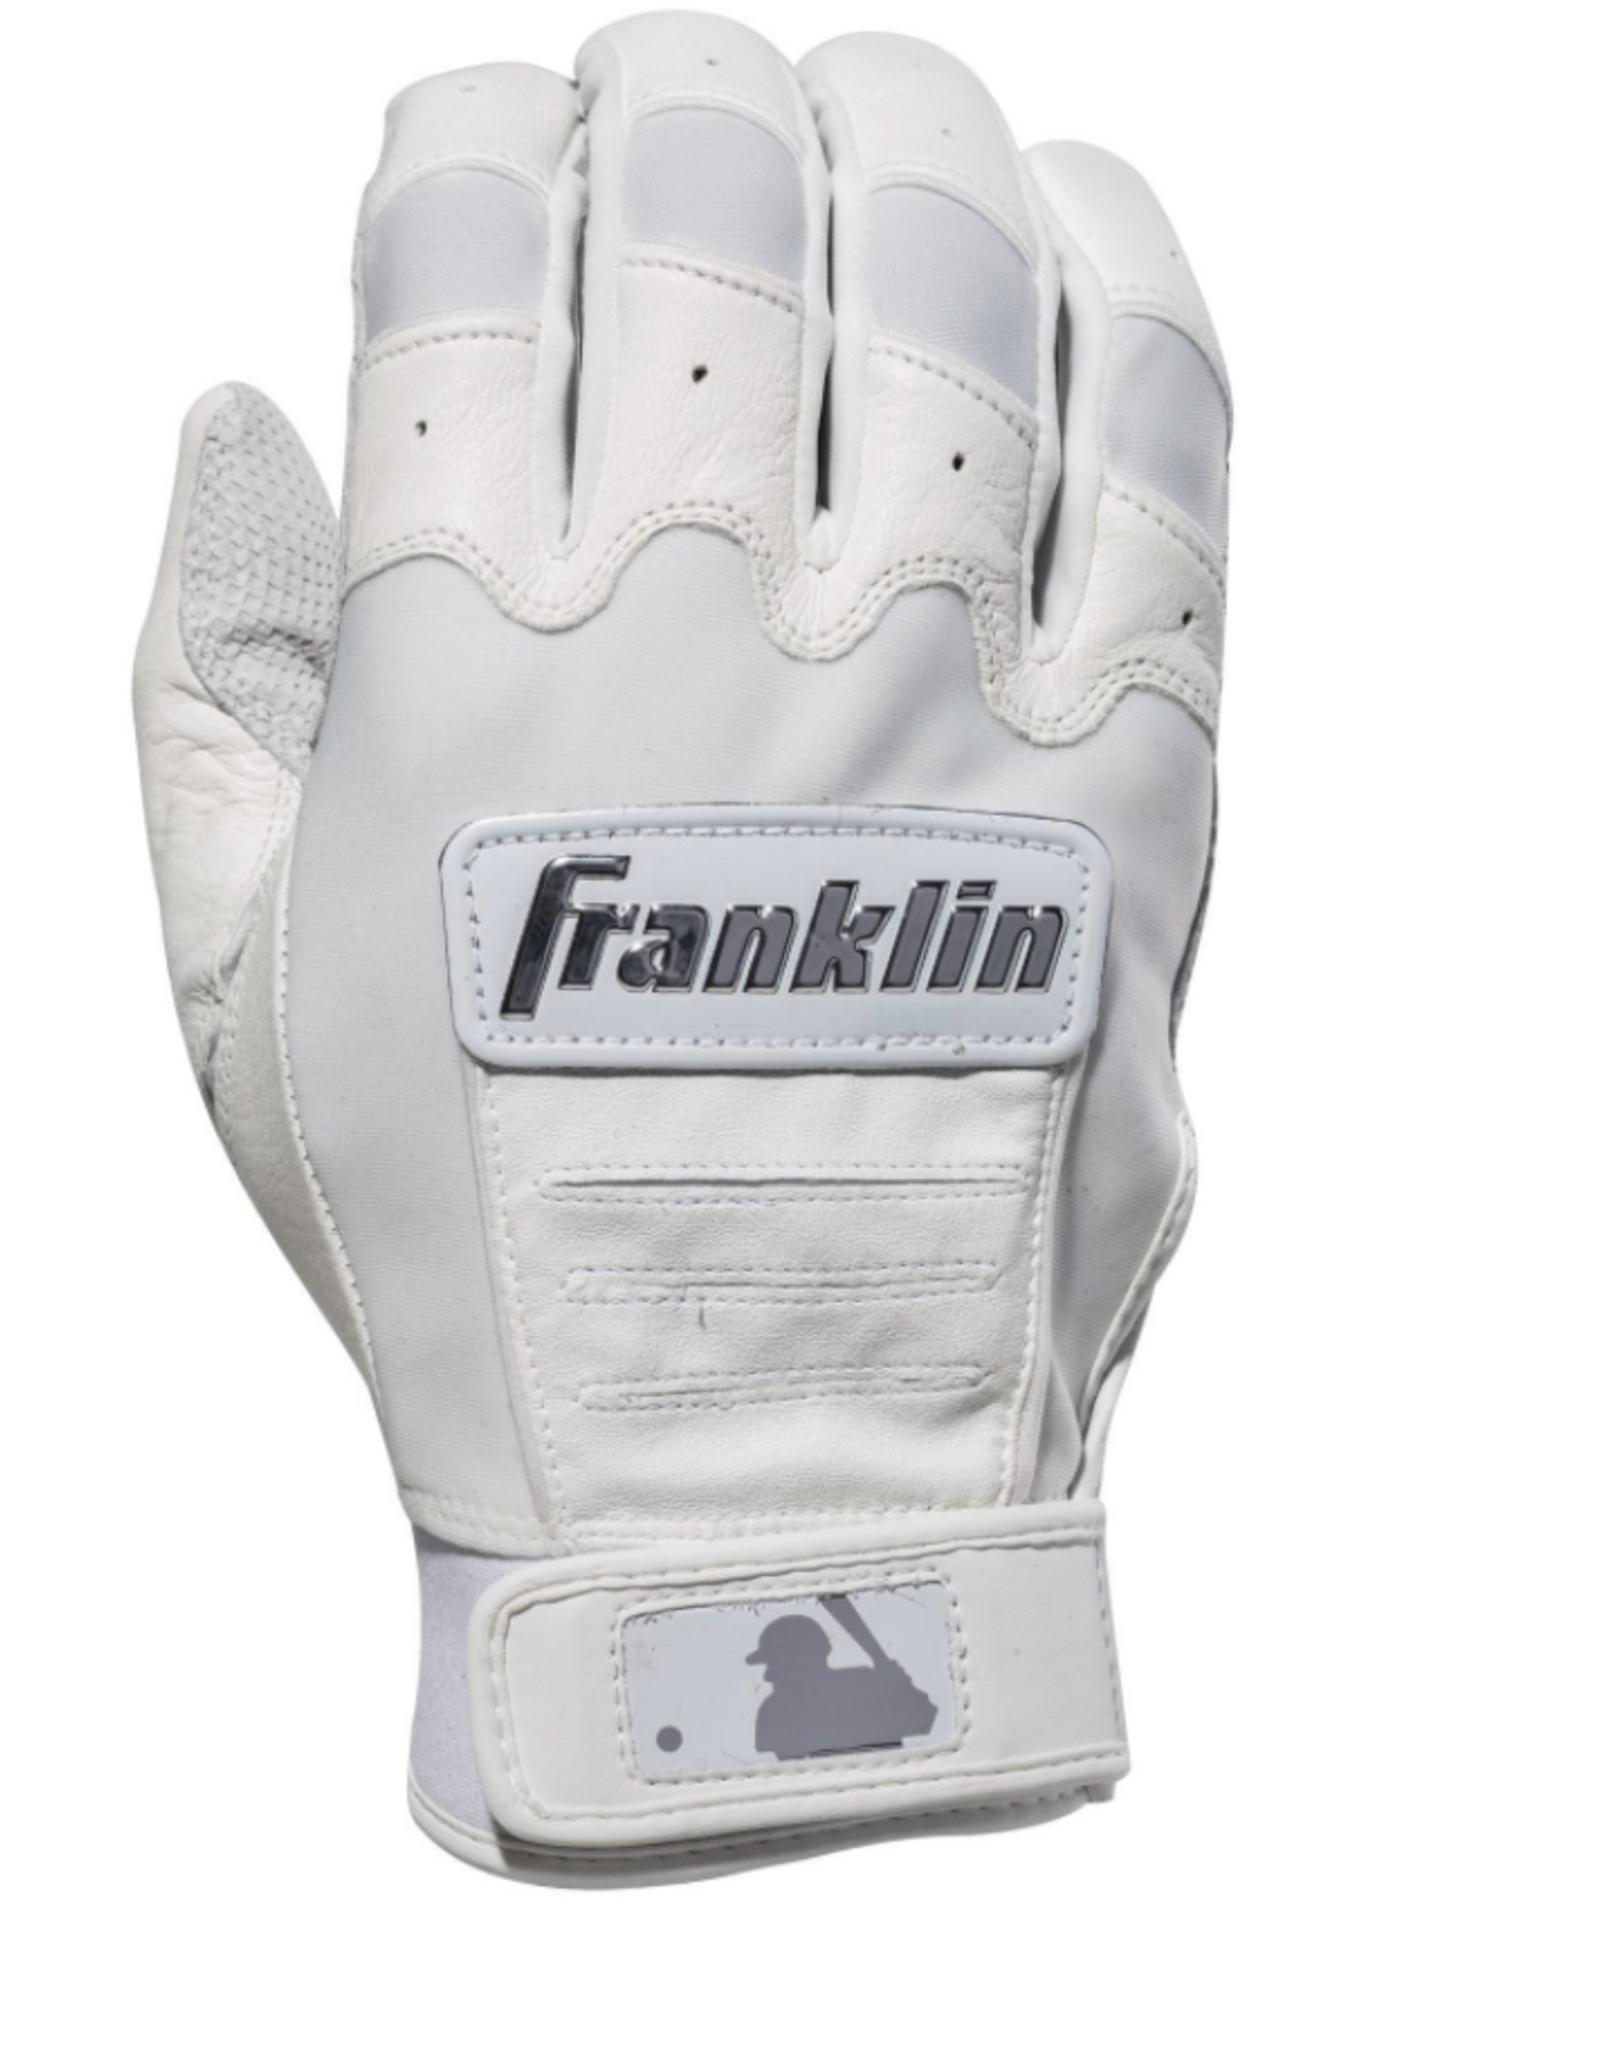 Franklin Franklin CFX Pro Batting Glove